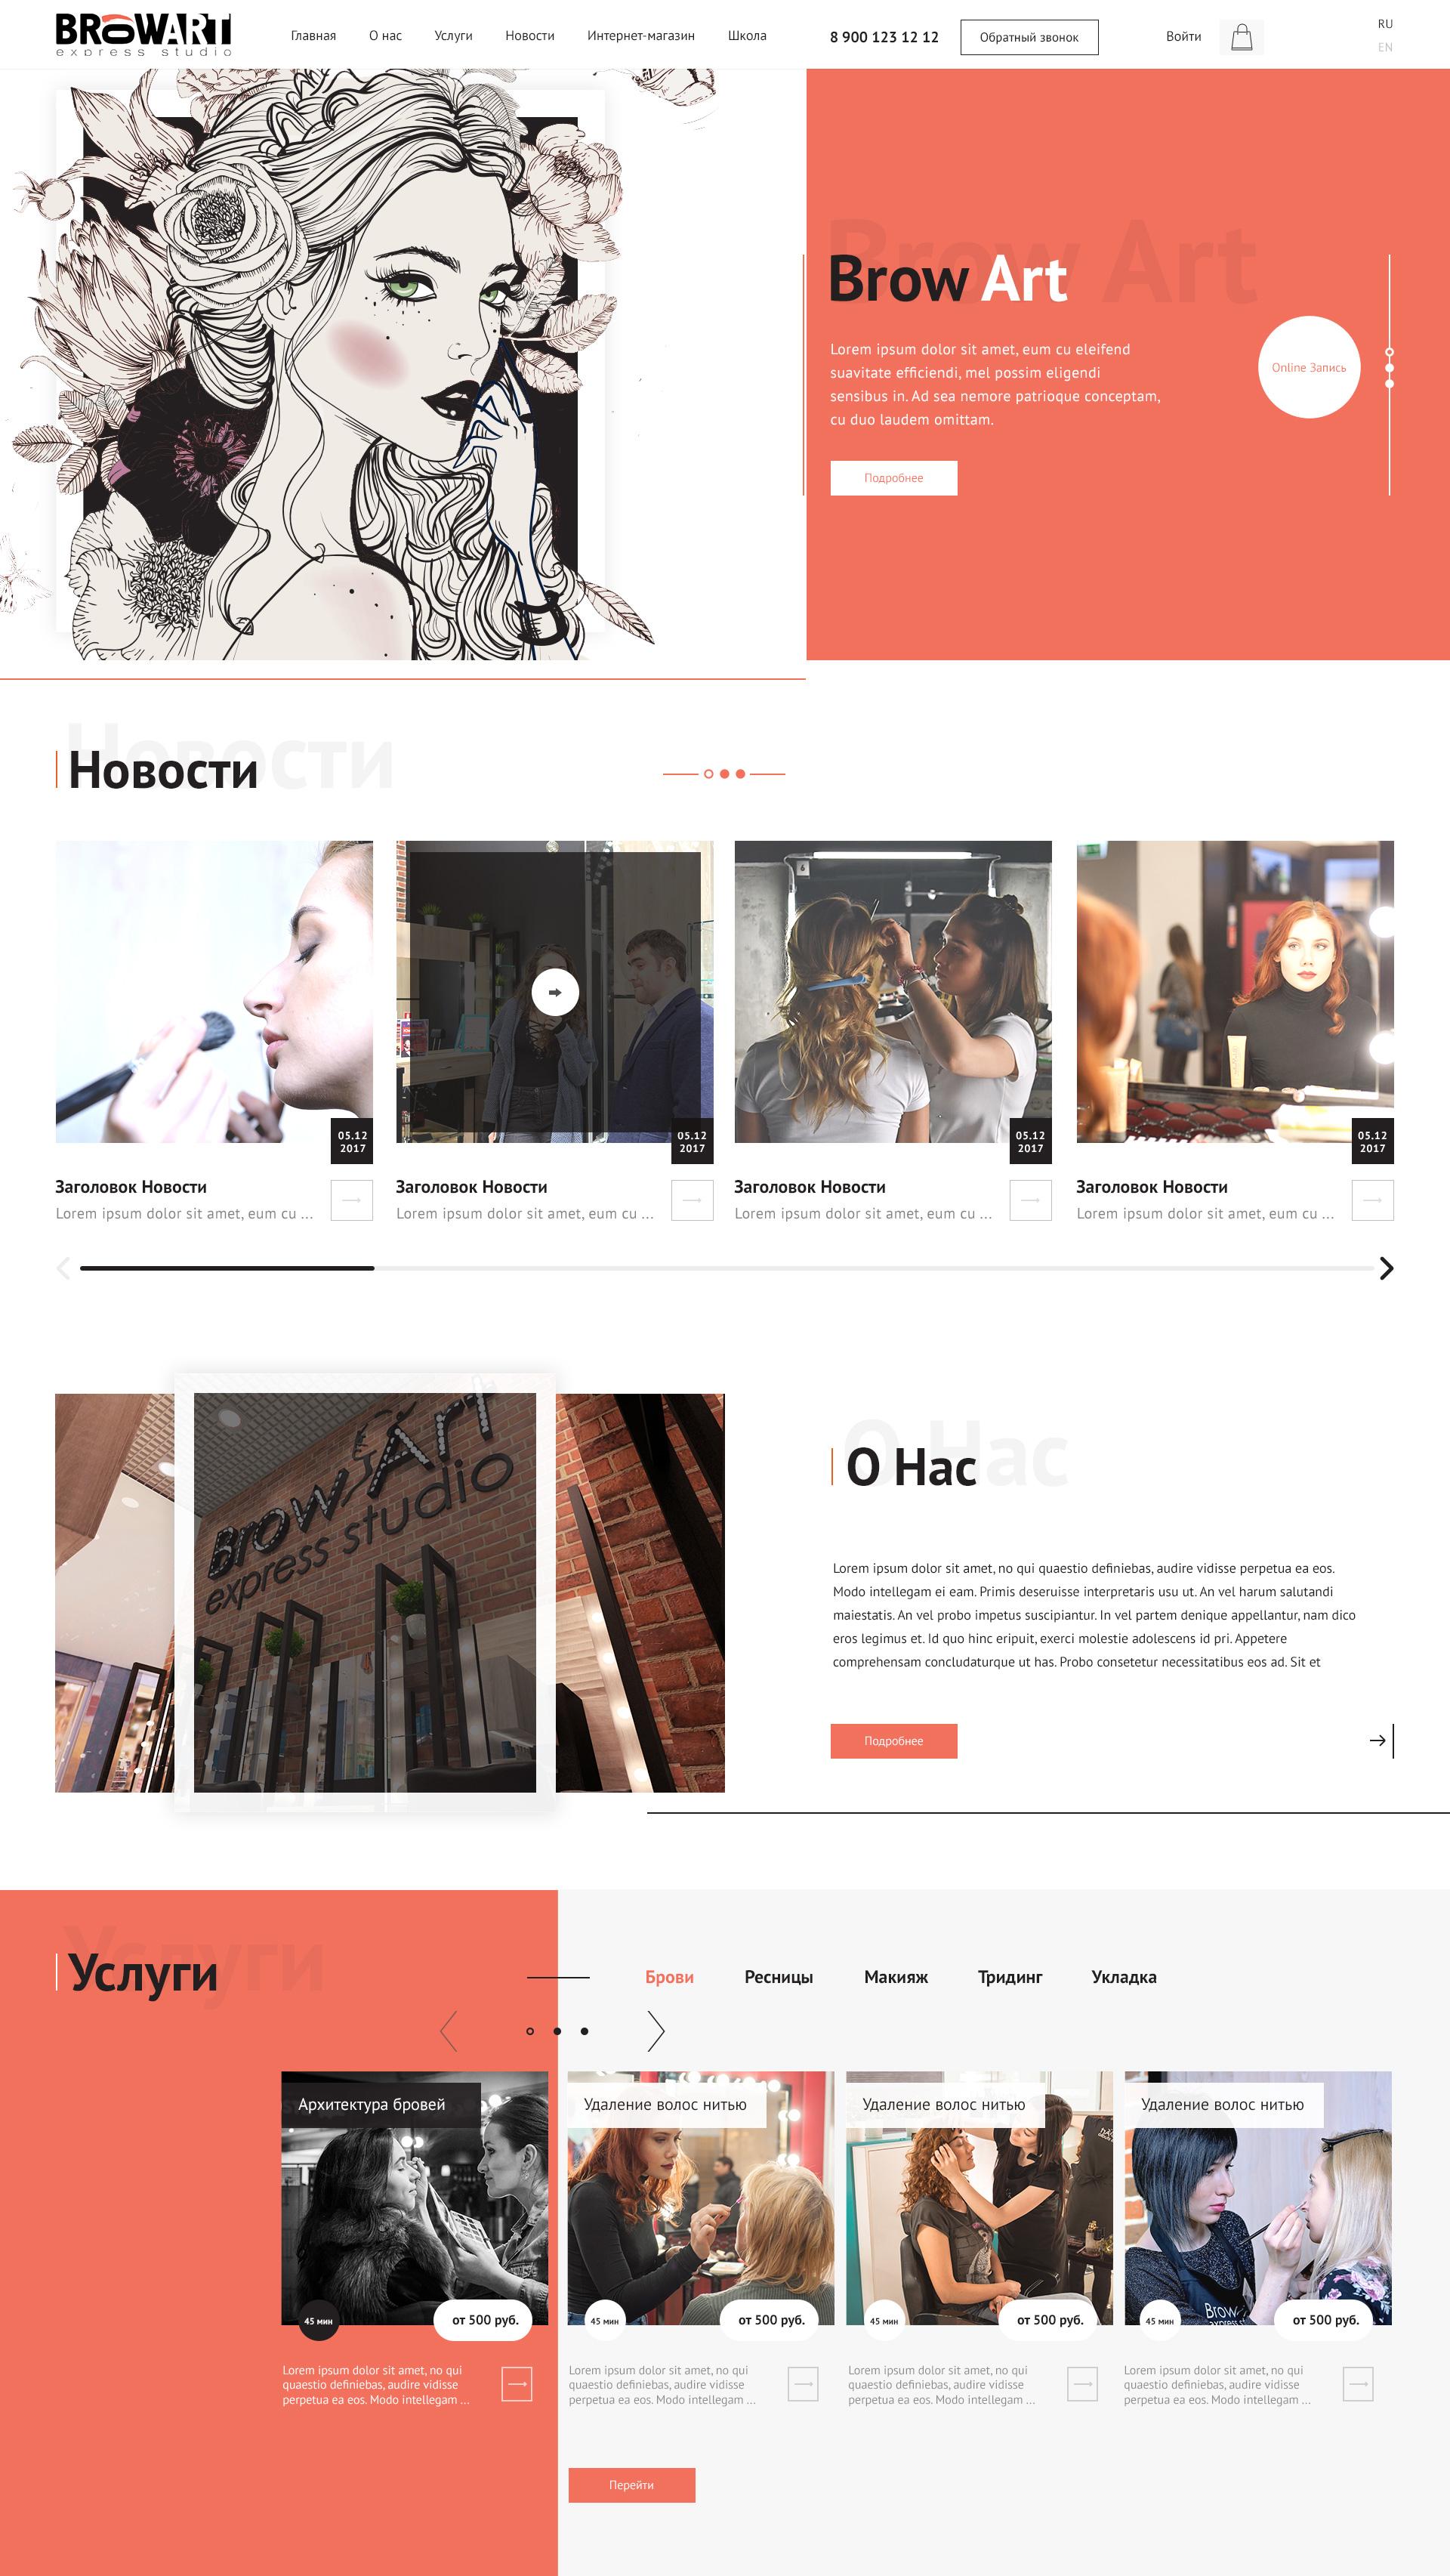 Дизайн сайта на основе готового прототипа-схемы и концепции фото f_9225a264c536770e.jpg